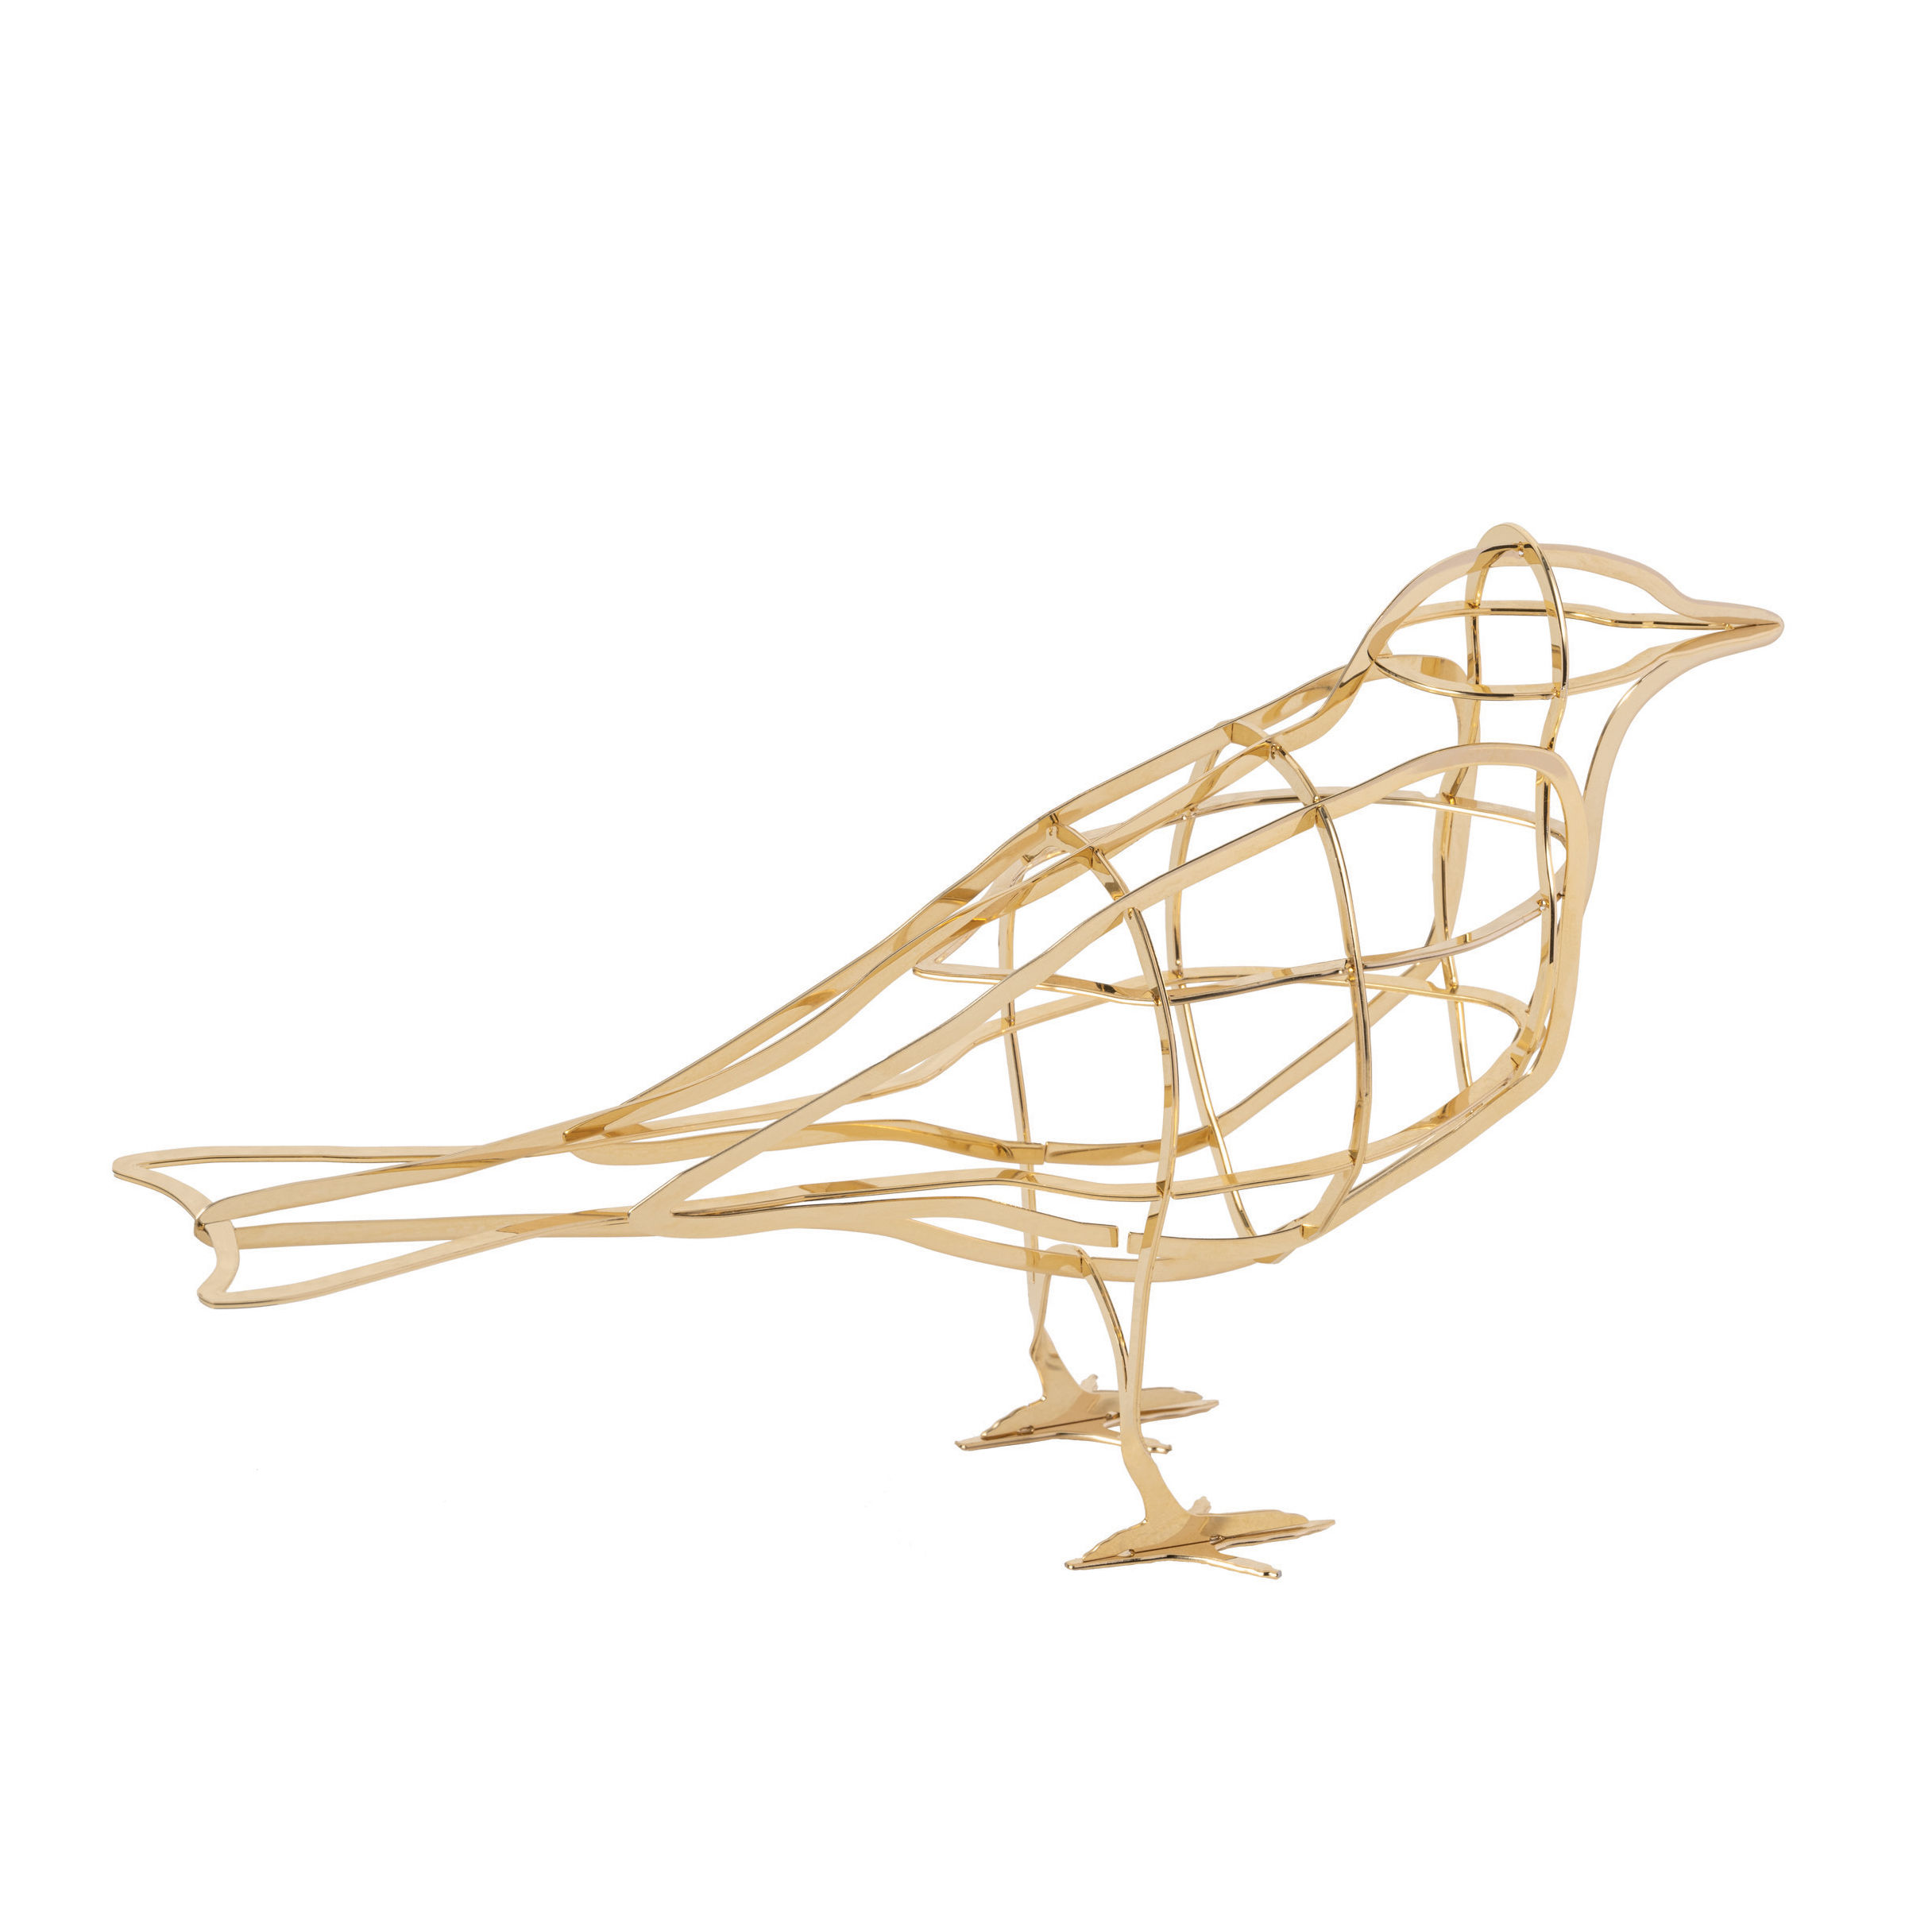 Dekoration - Dekorationsartikel - De l'Aube Dekoration / Vogel aus Metall - Ibride -